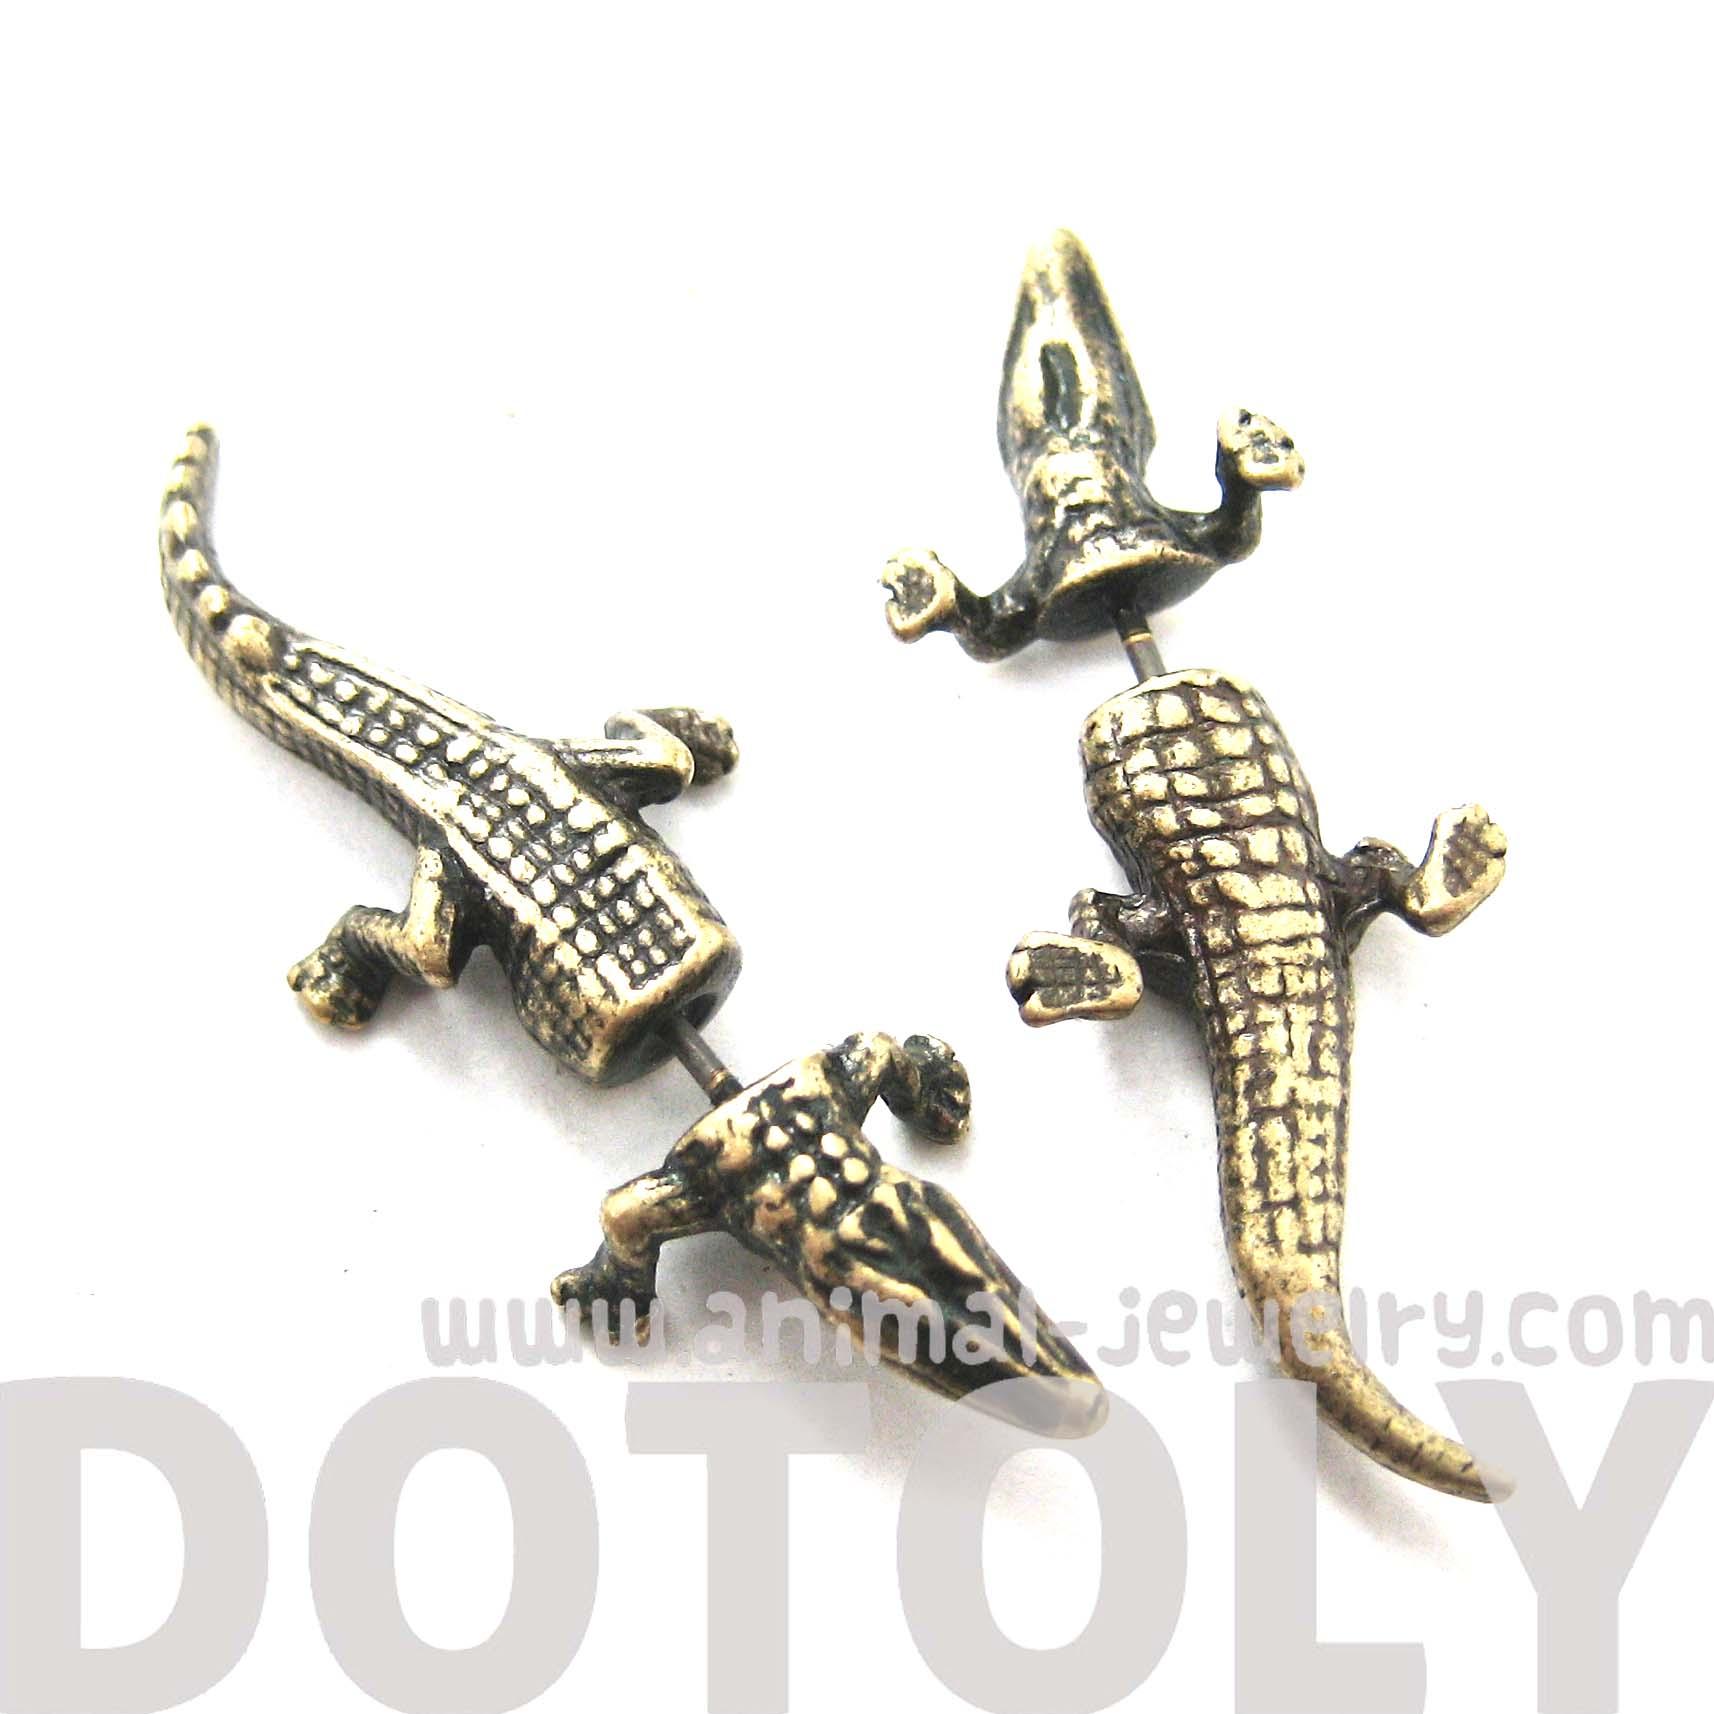 Fake Gauge Crocodile Alligator Animal Stud Earrings In Brass   Thumbnail 3